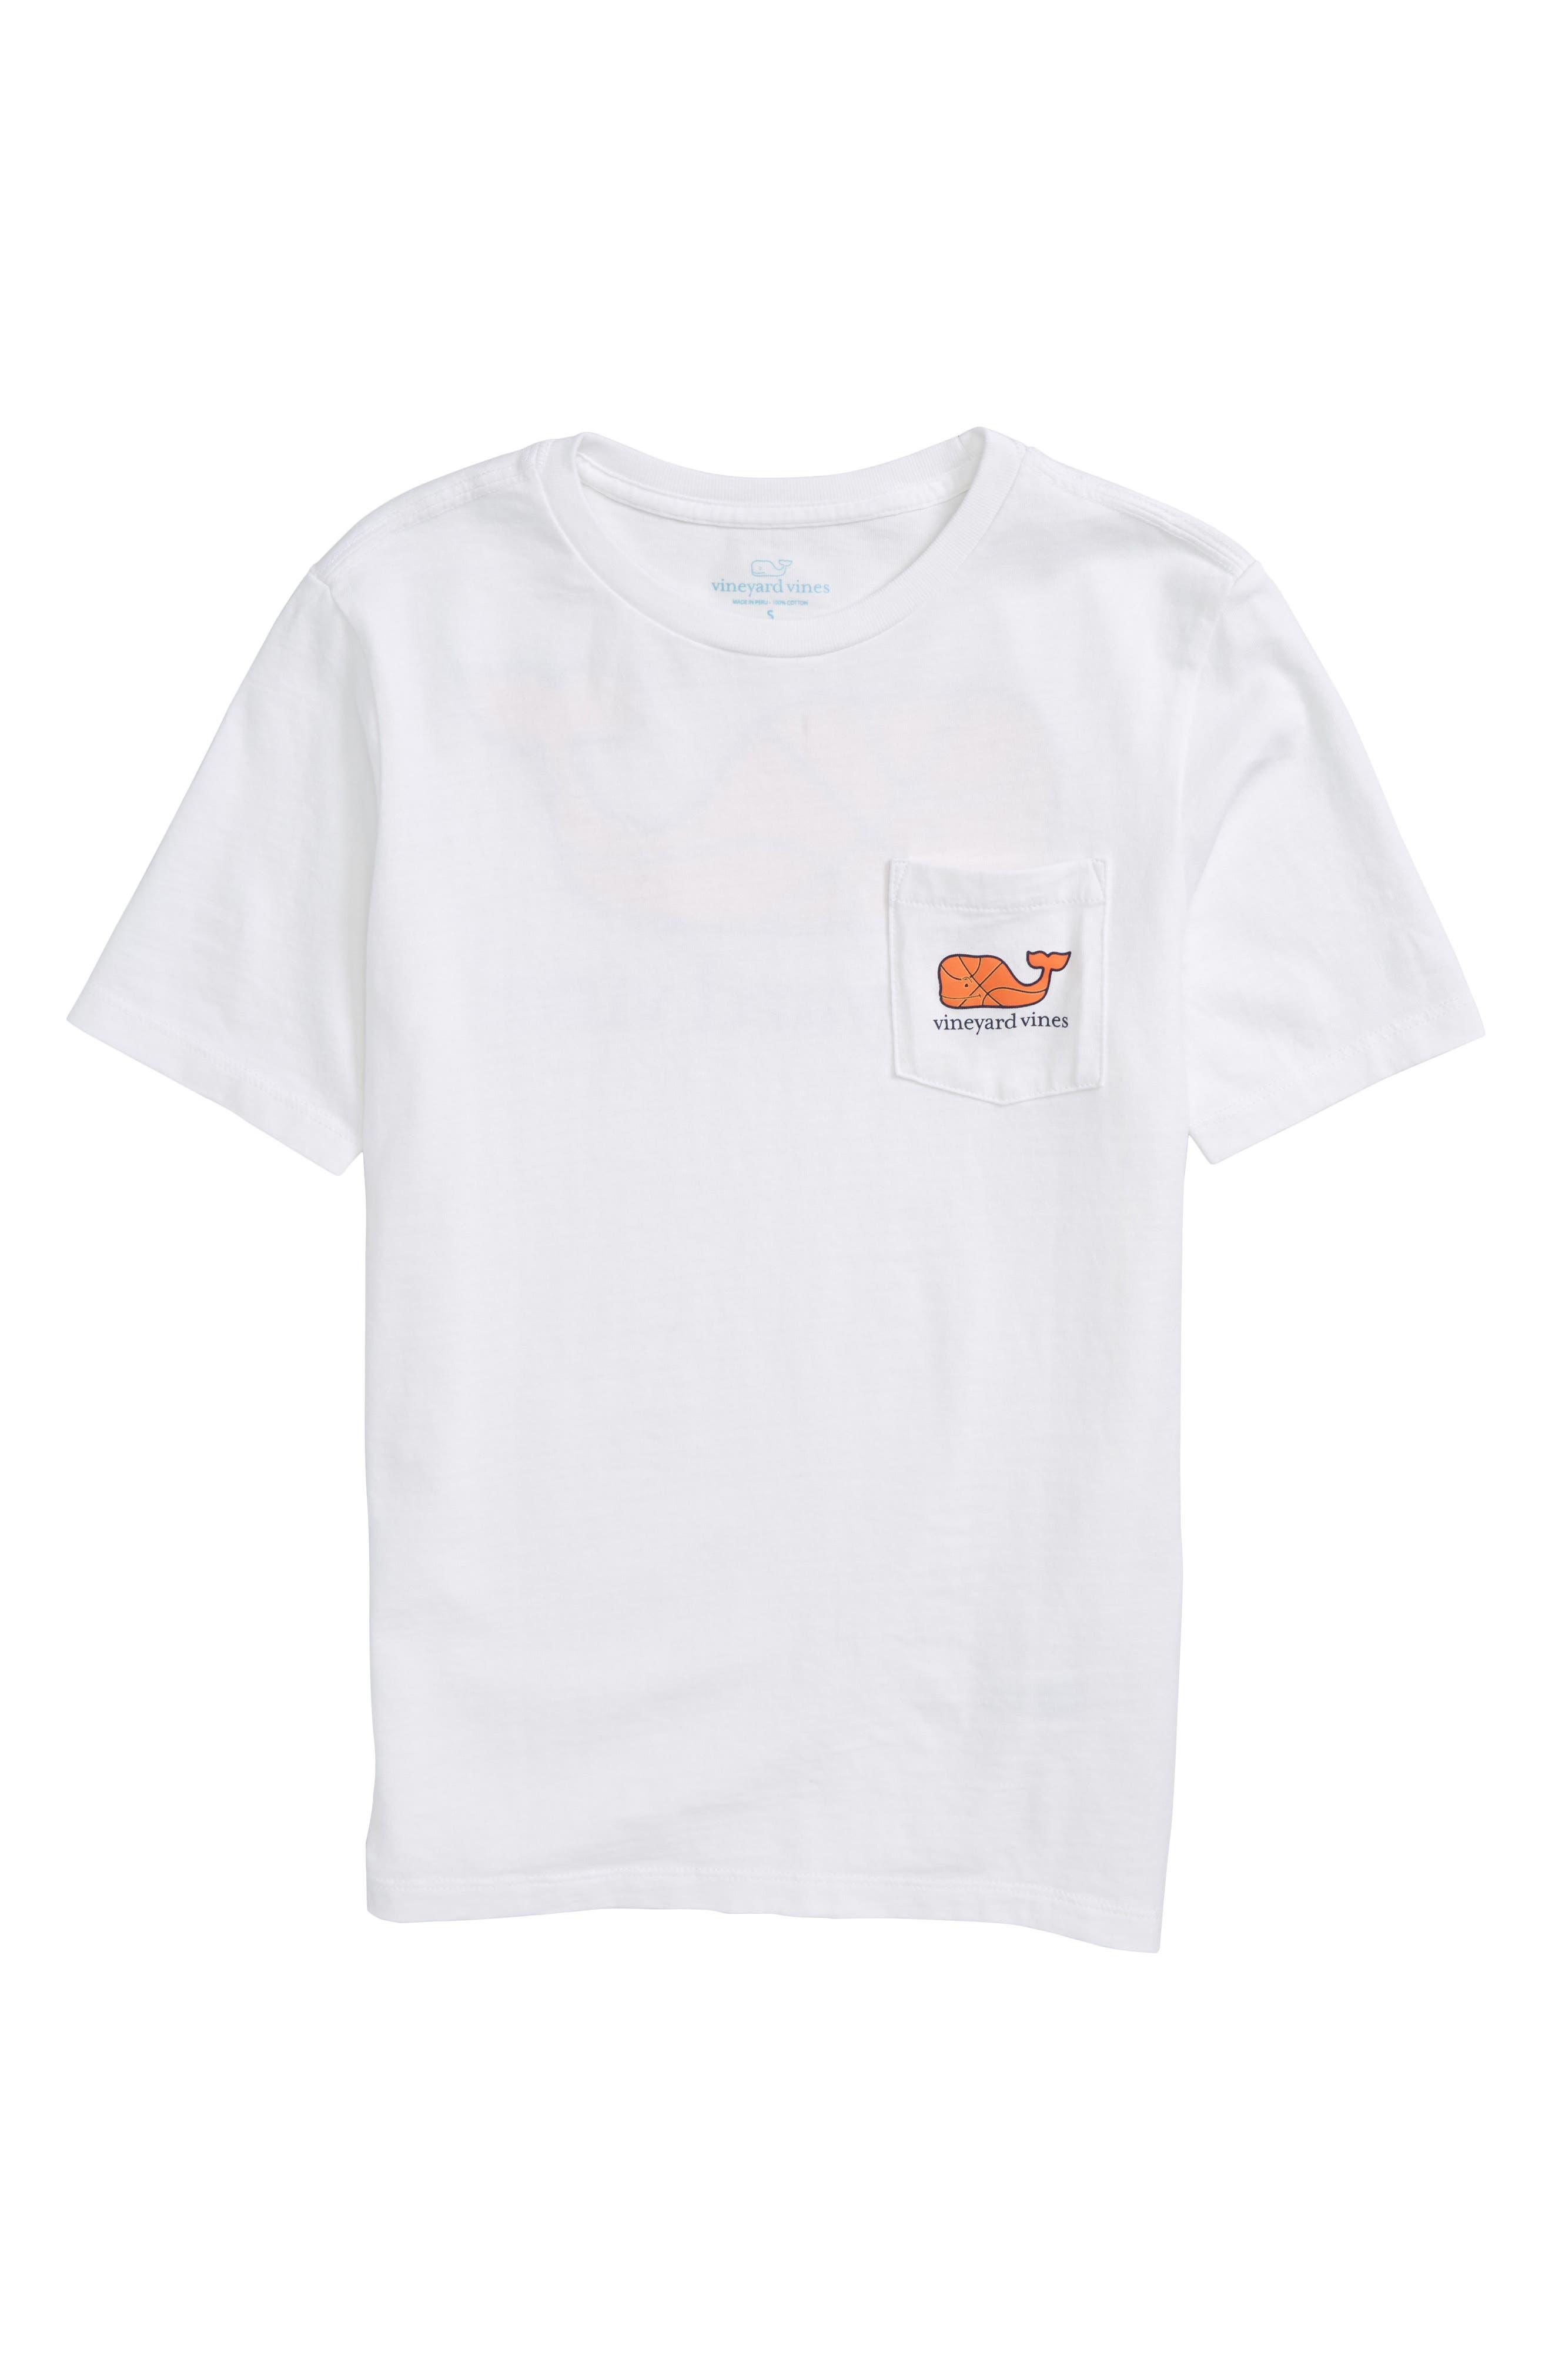 Basketball Whale T-Shirt,                             Main thumbnail 1, color,                             100